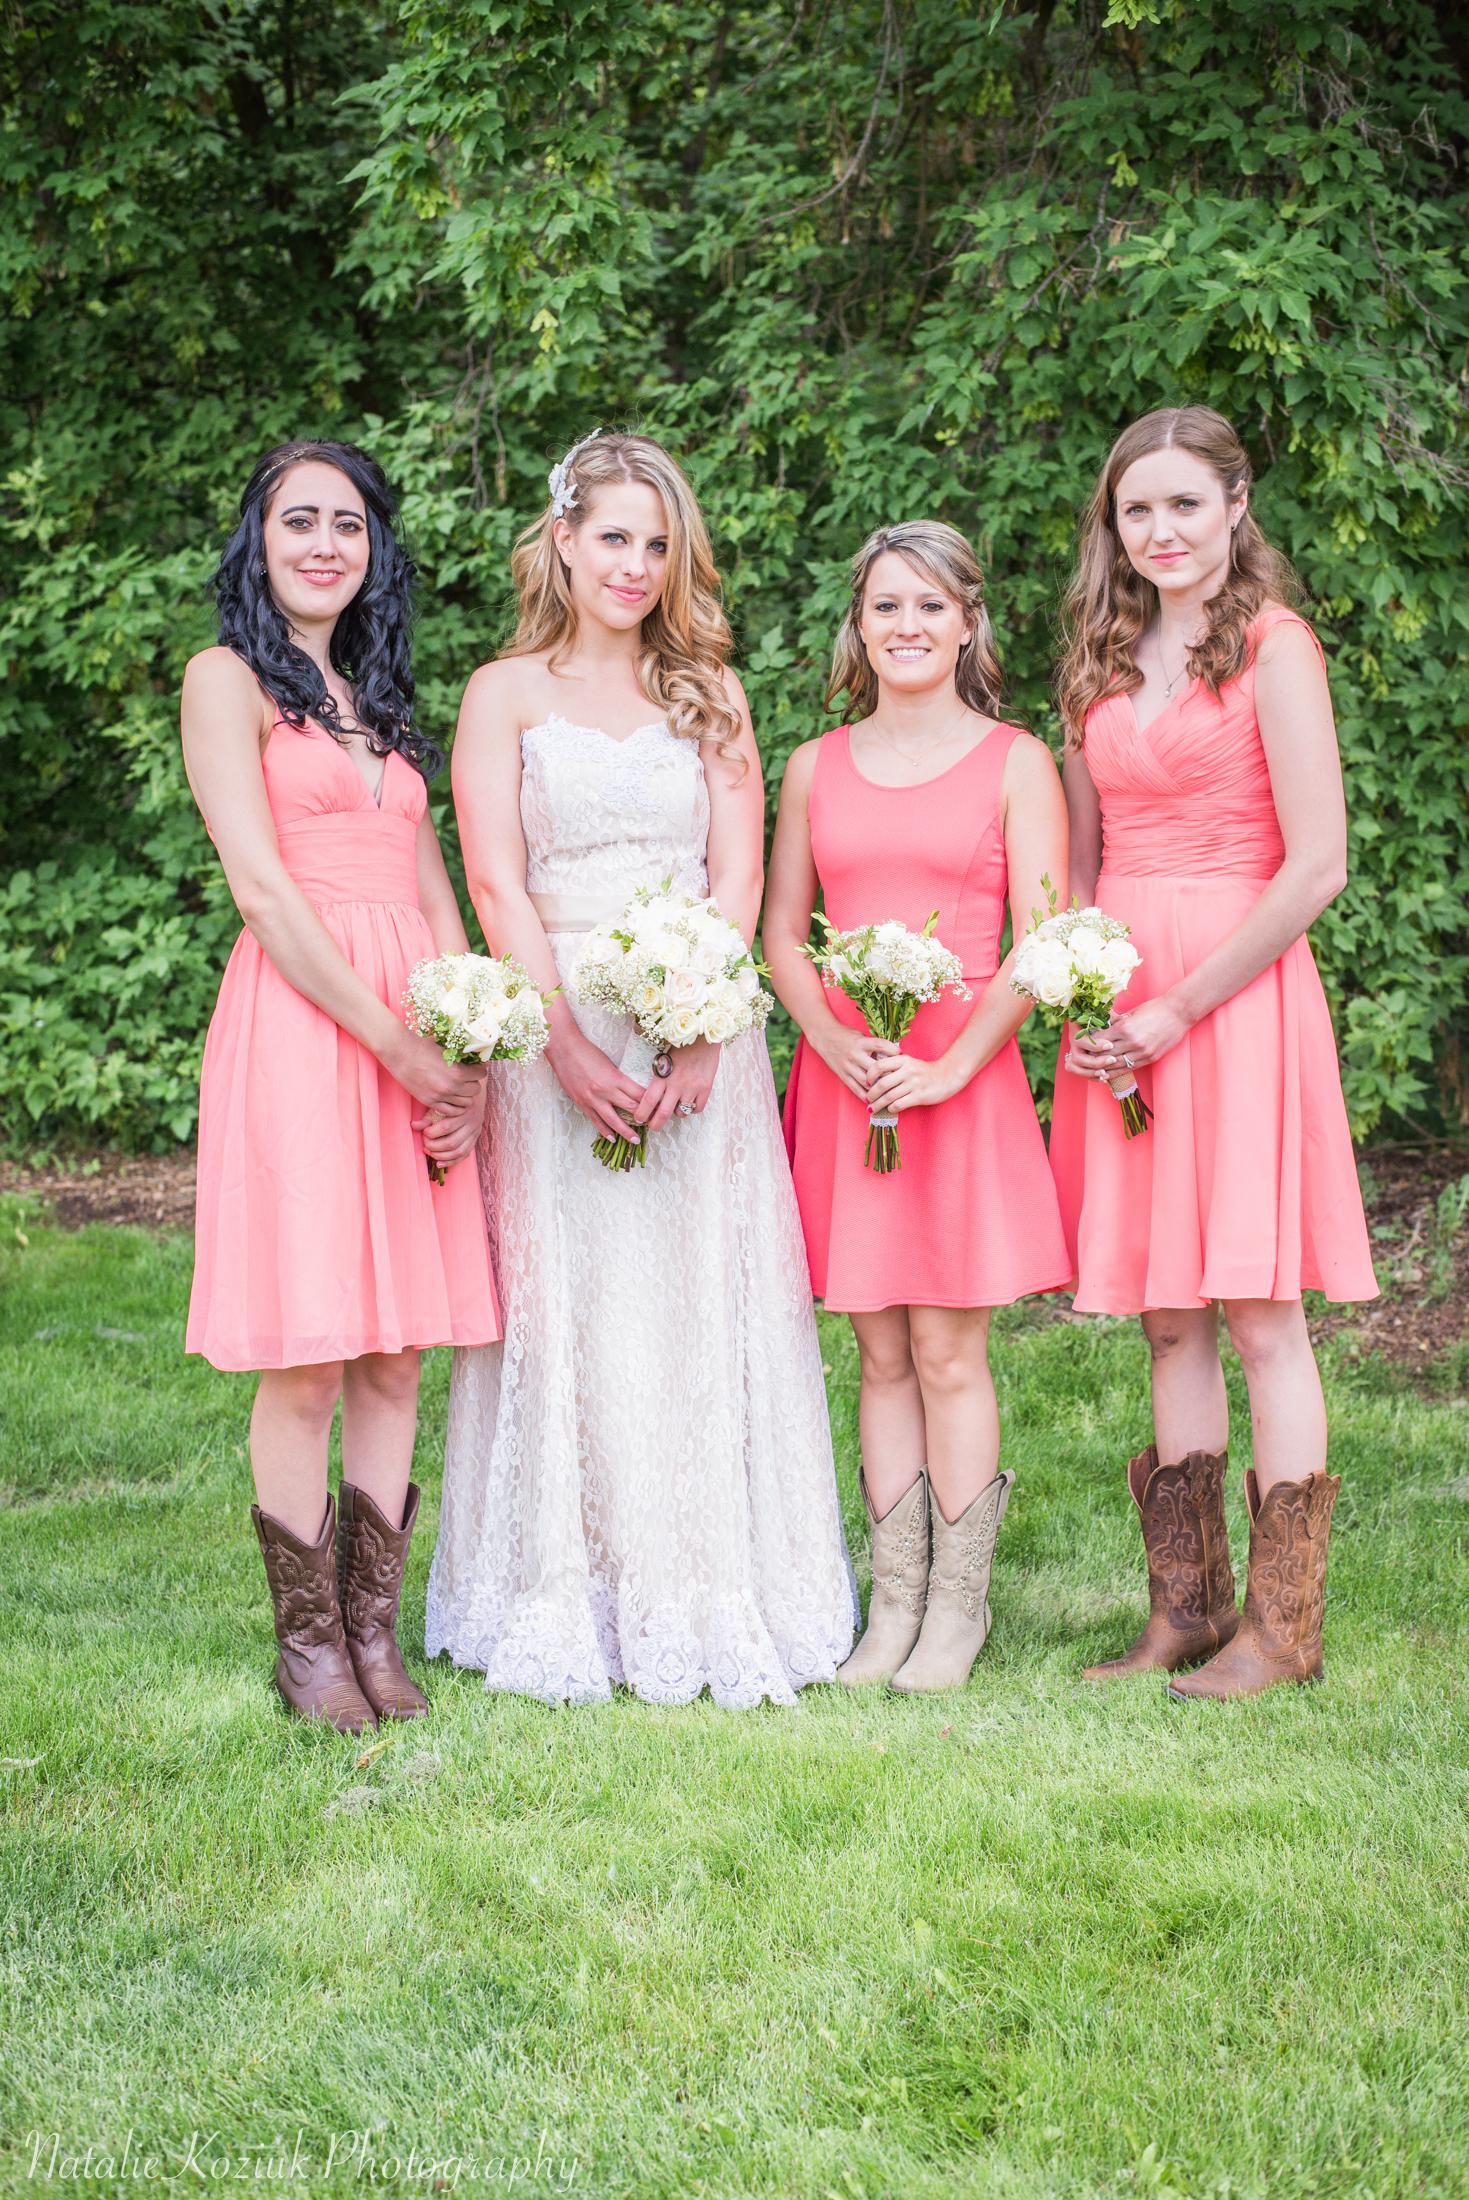 Natalie Koziuk Photography | Boise wedding photographer | bridesmaids | Star, ID | Bride Groom | nkoziukphotography.com